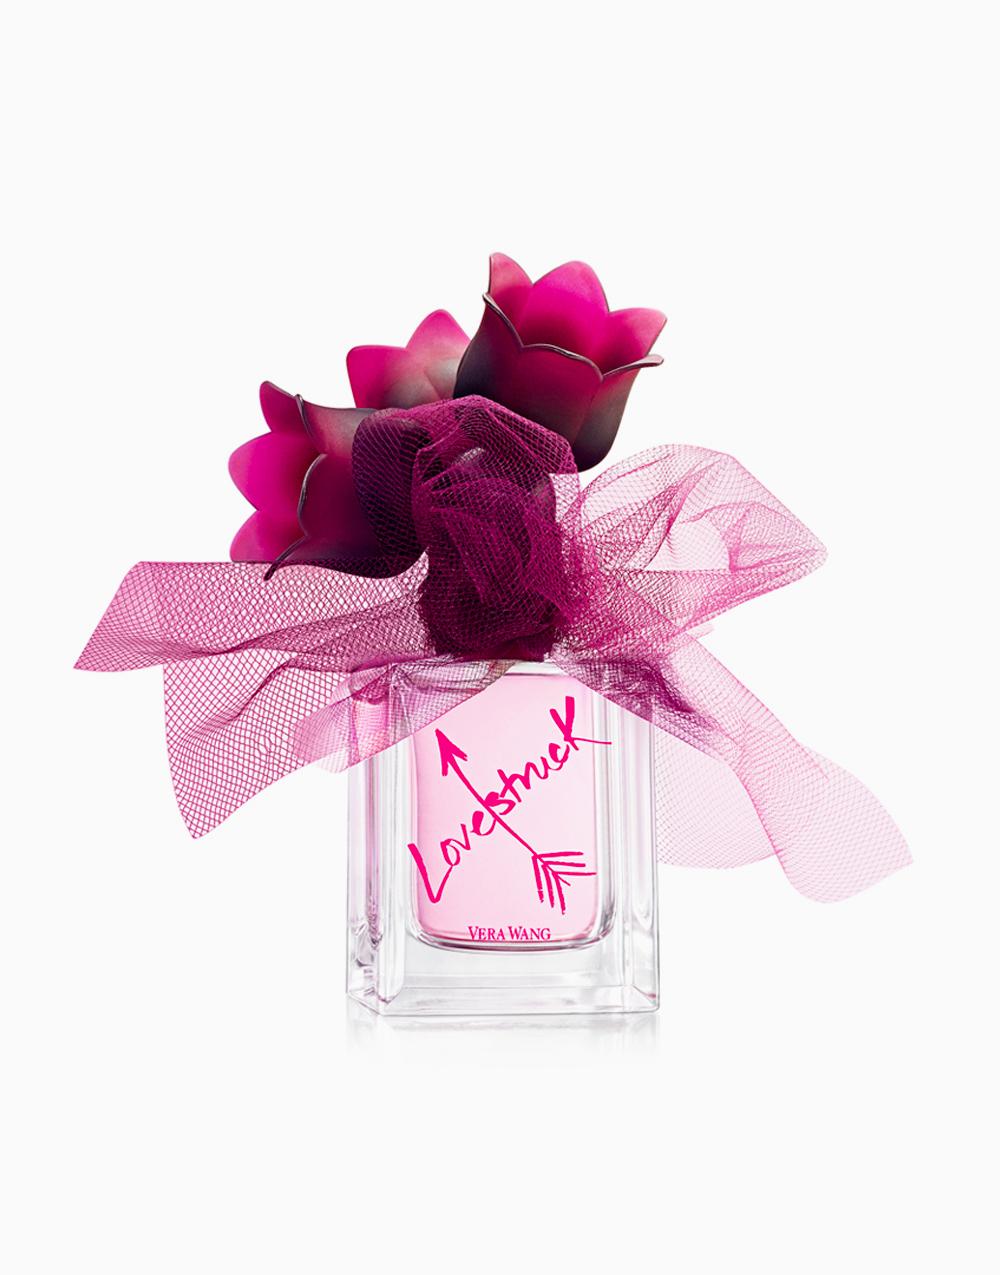 Vera Wang Lovestruck Perfume (100ml) by Vera Wang